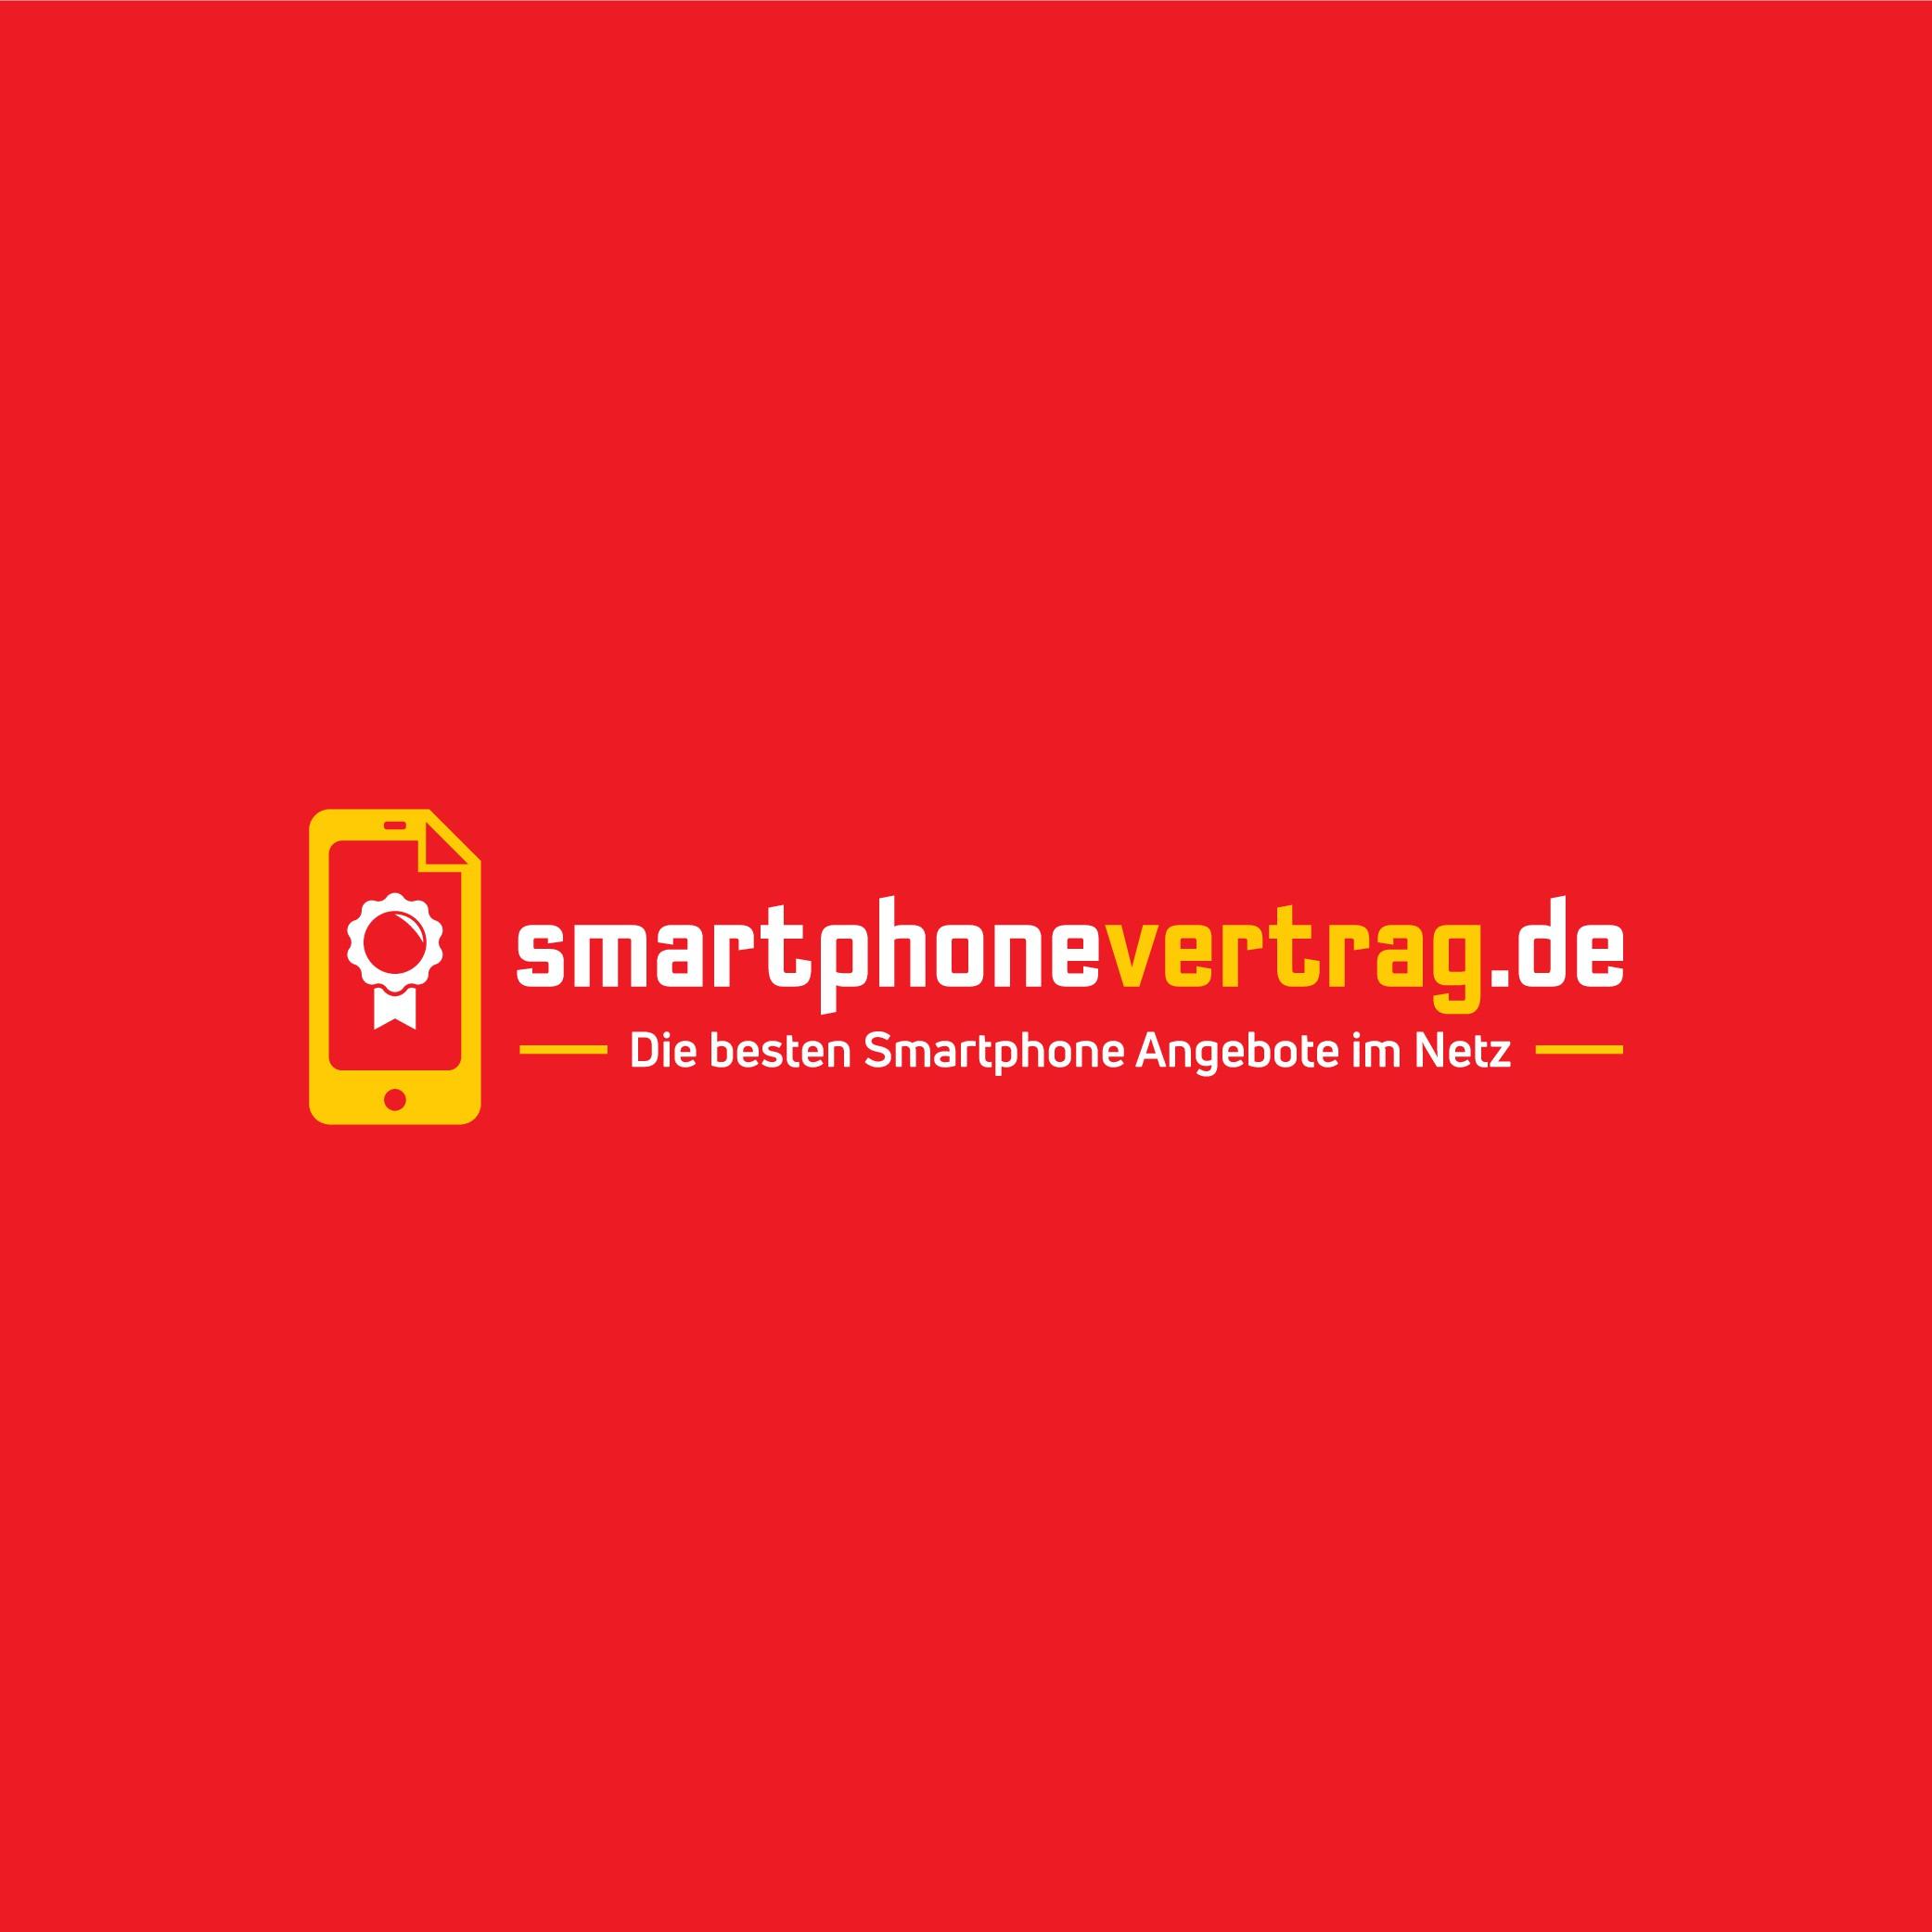 smartphonevertrag.de Logo Design